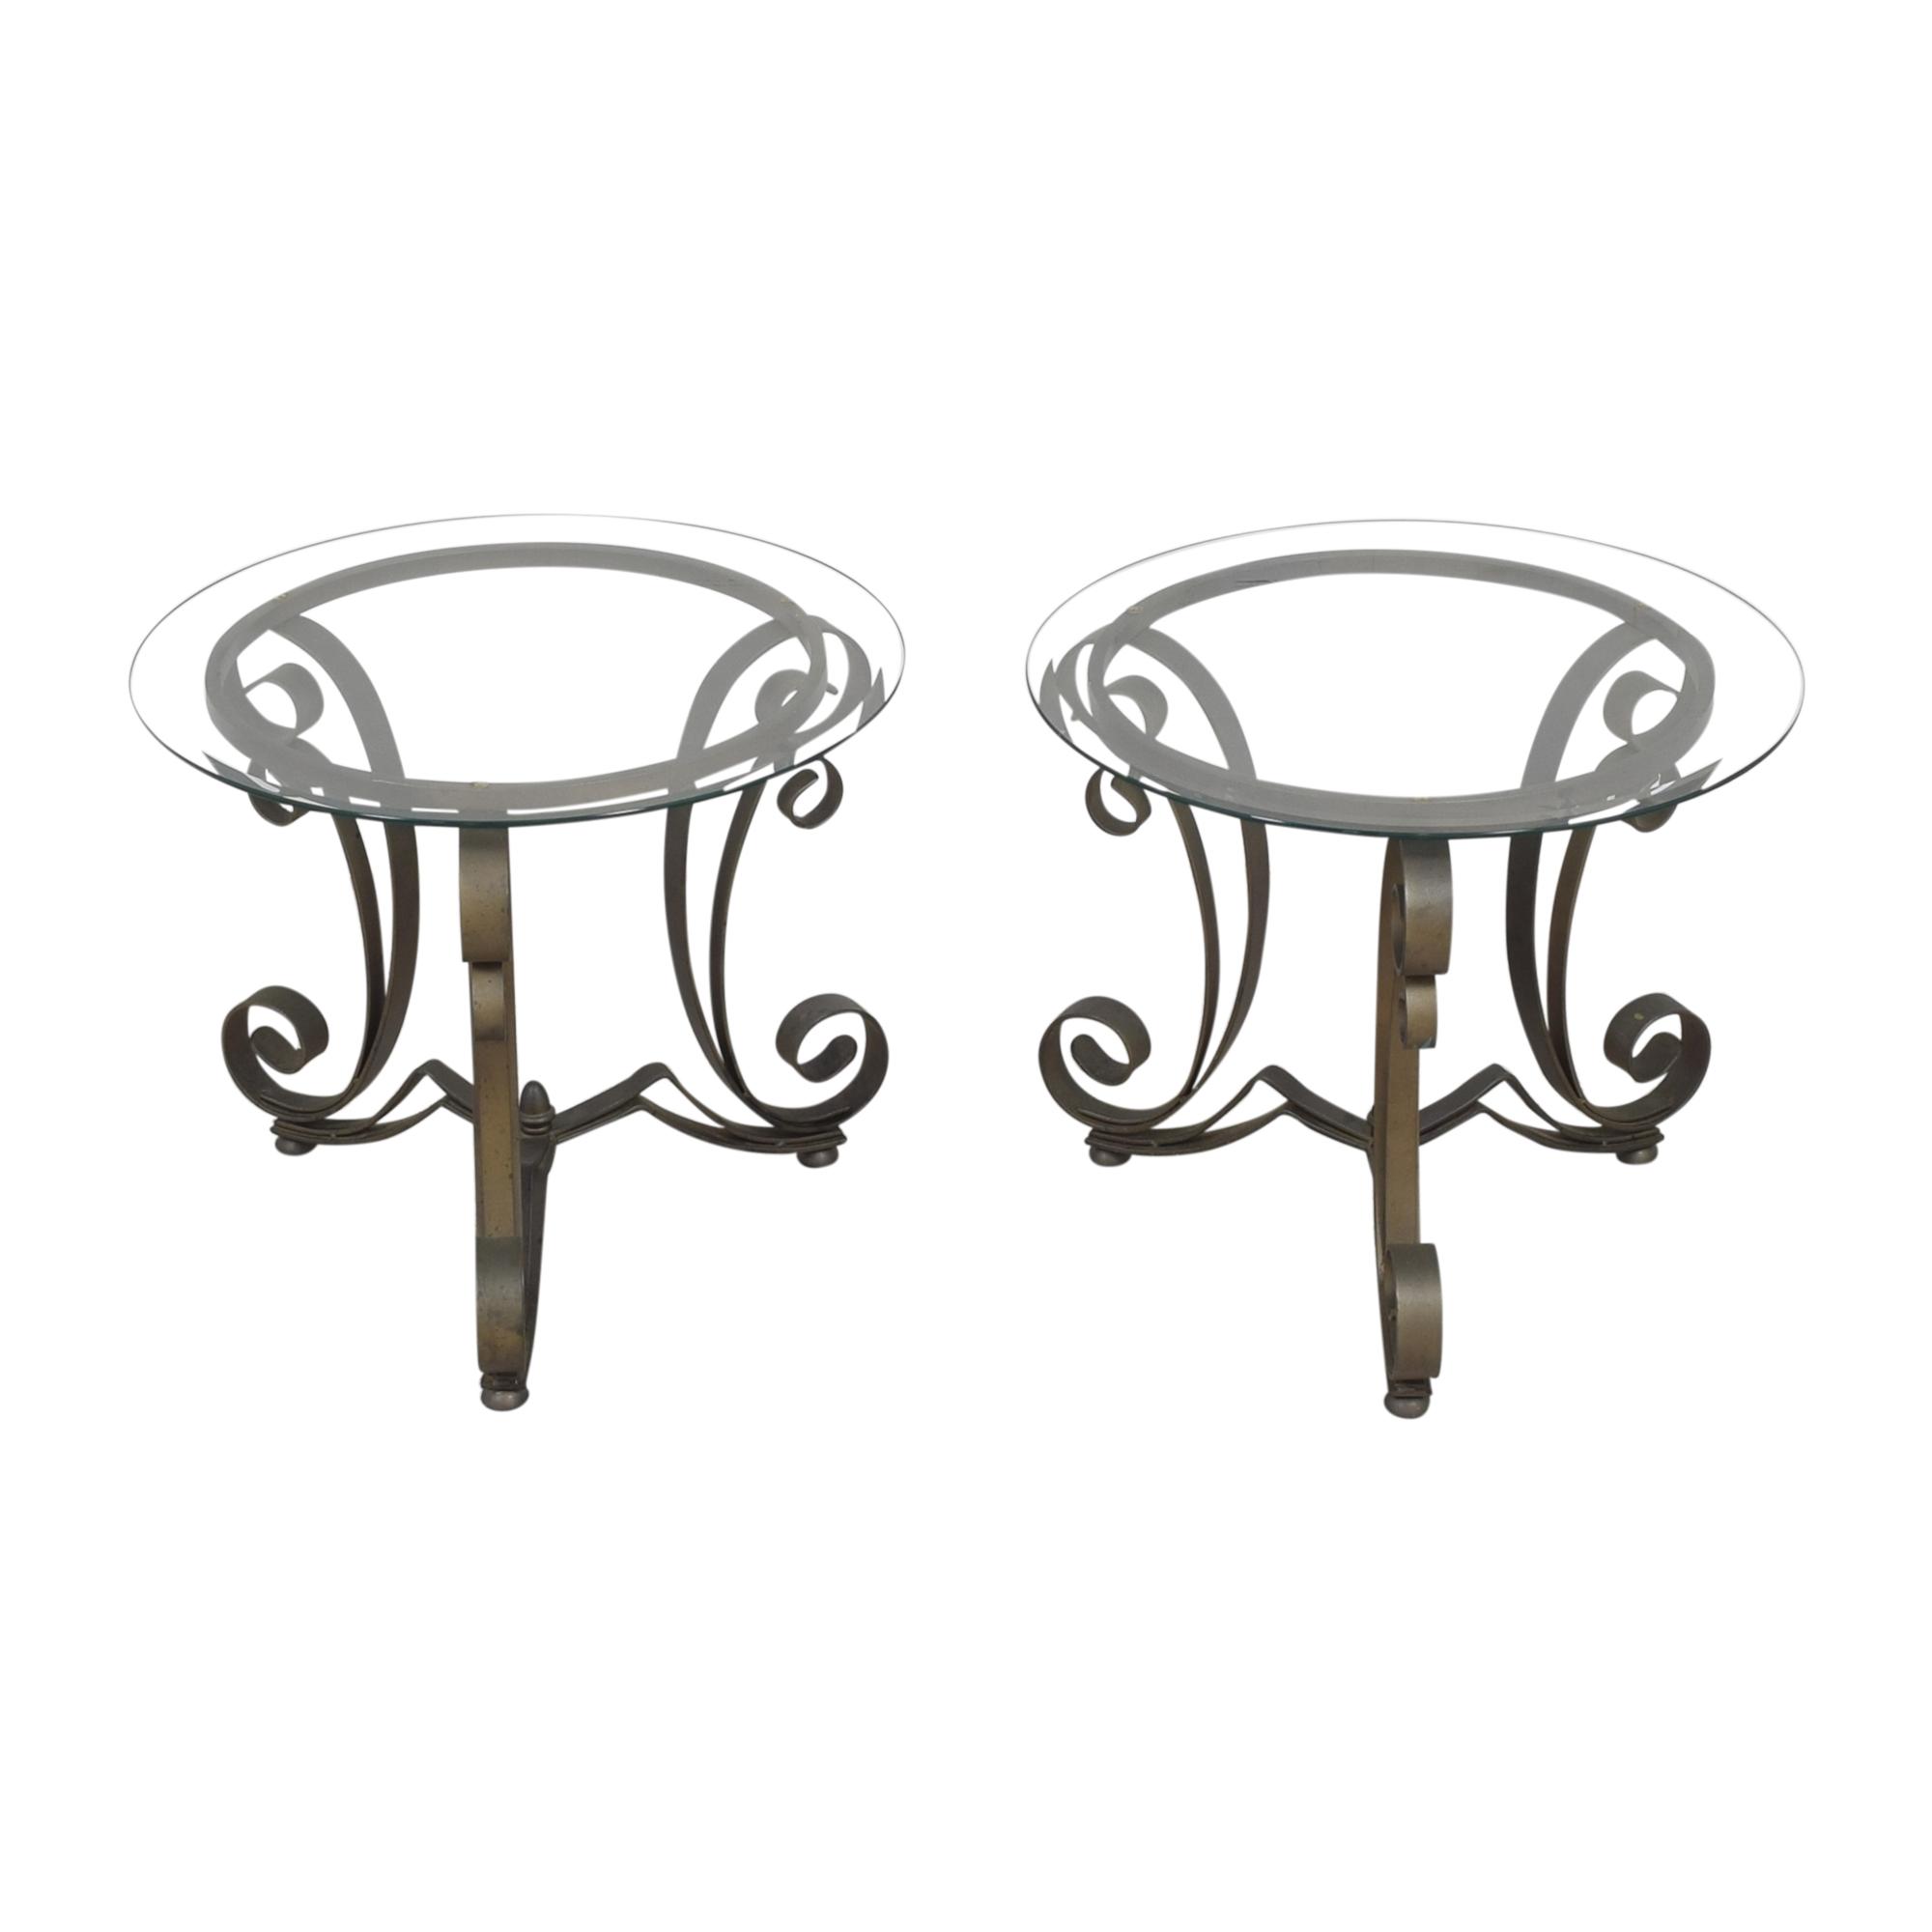 Bloomingdale's Art Deco End Tables / End Tables